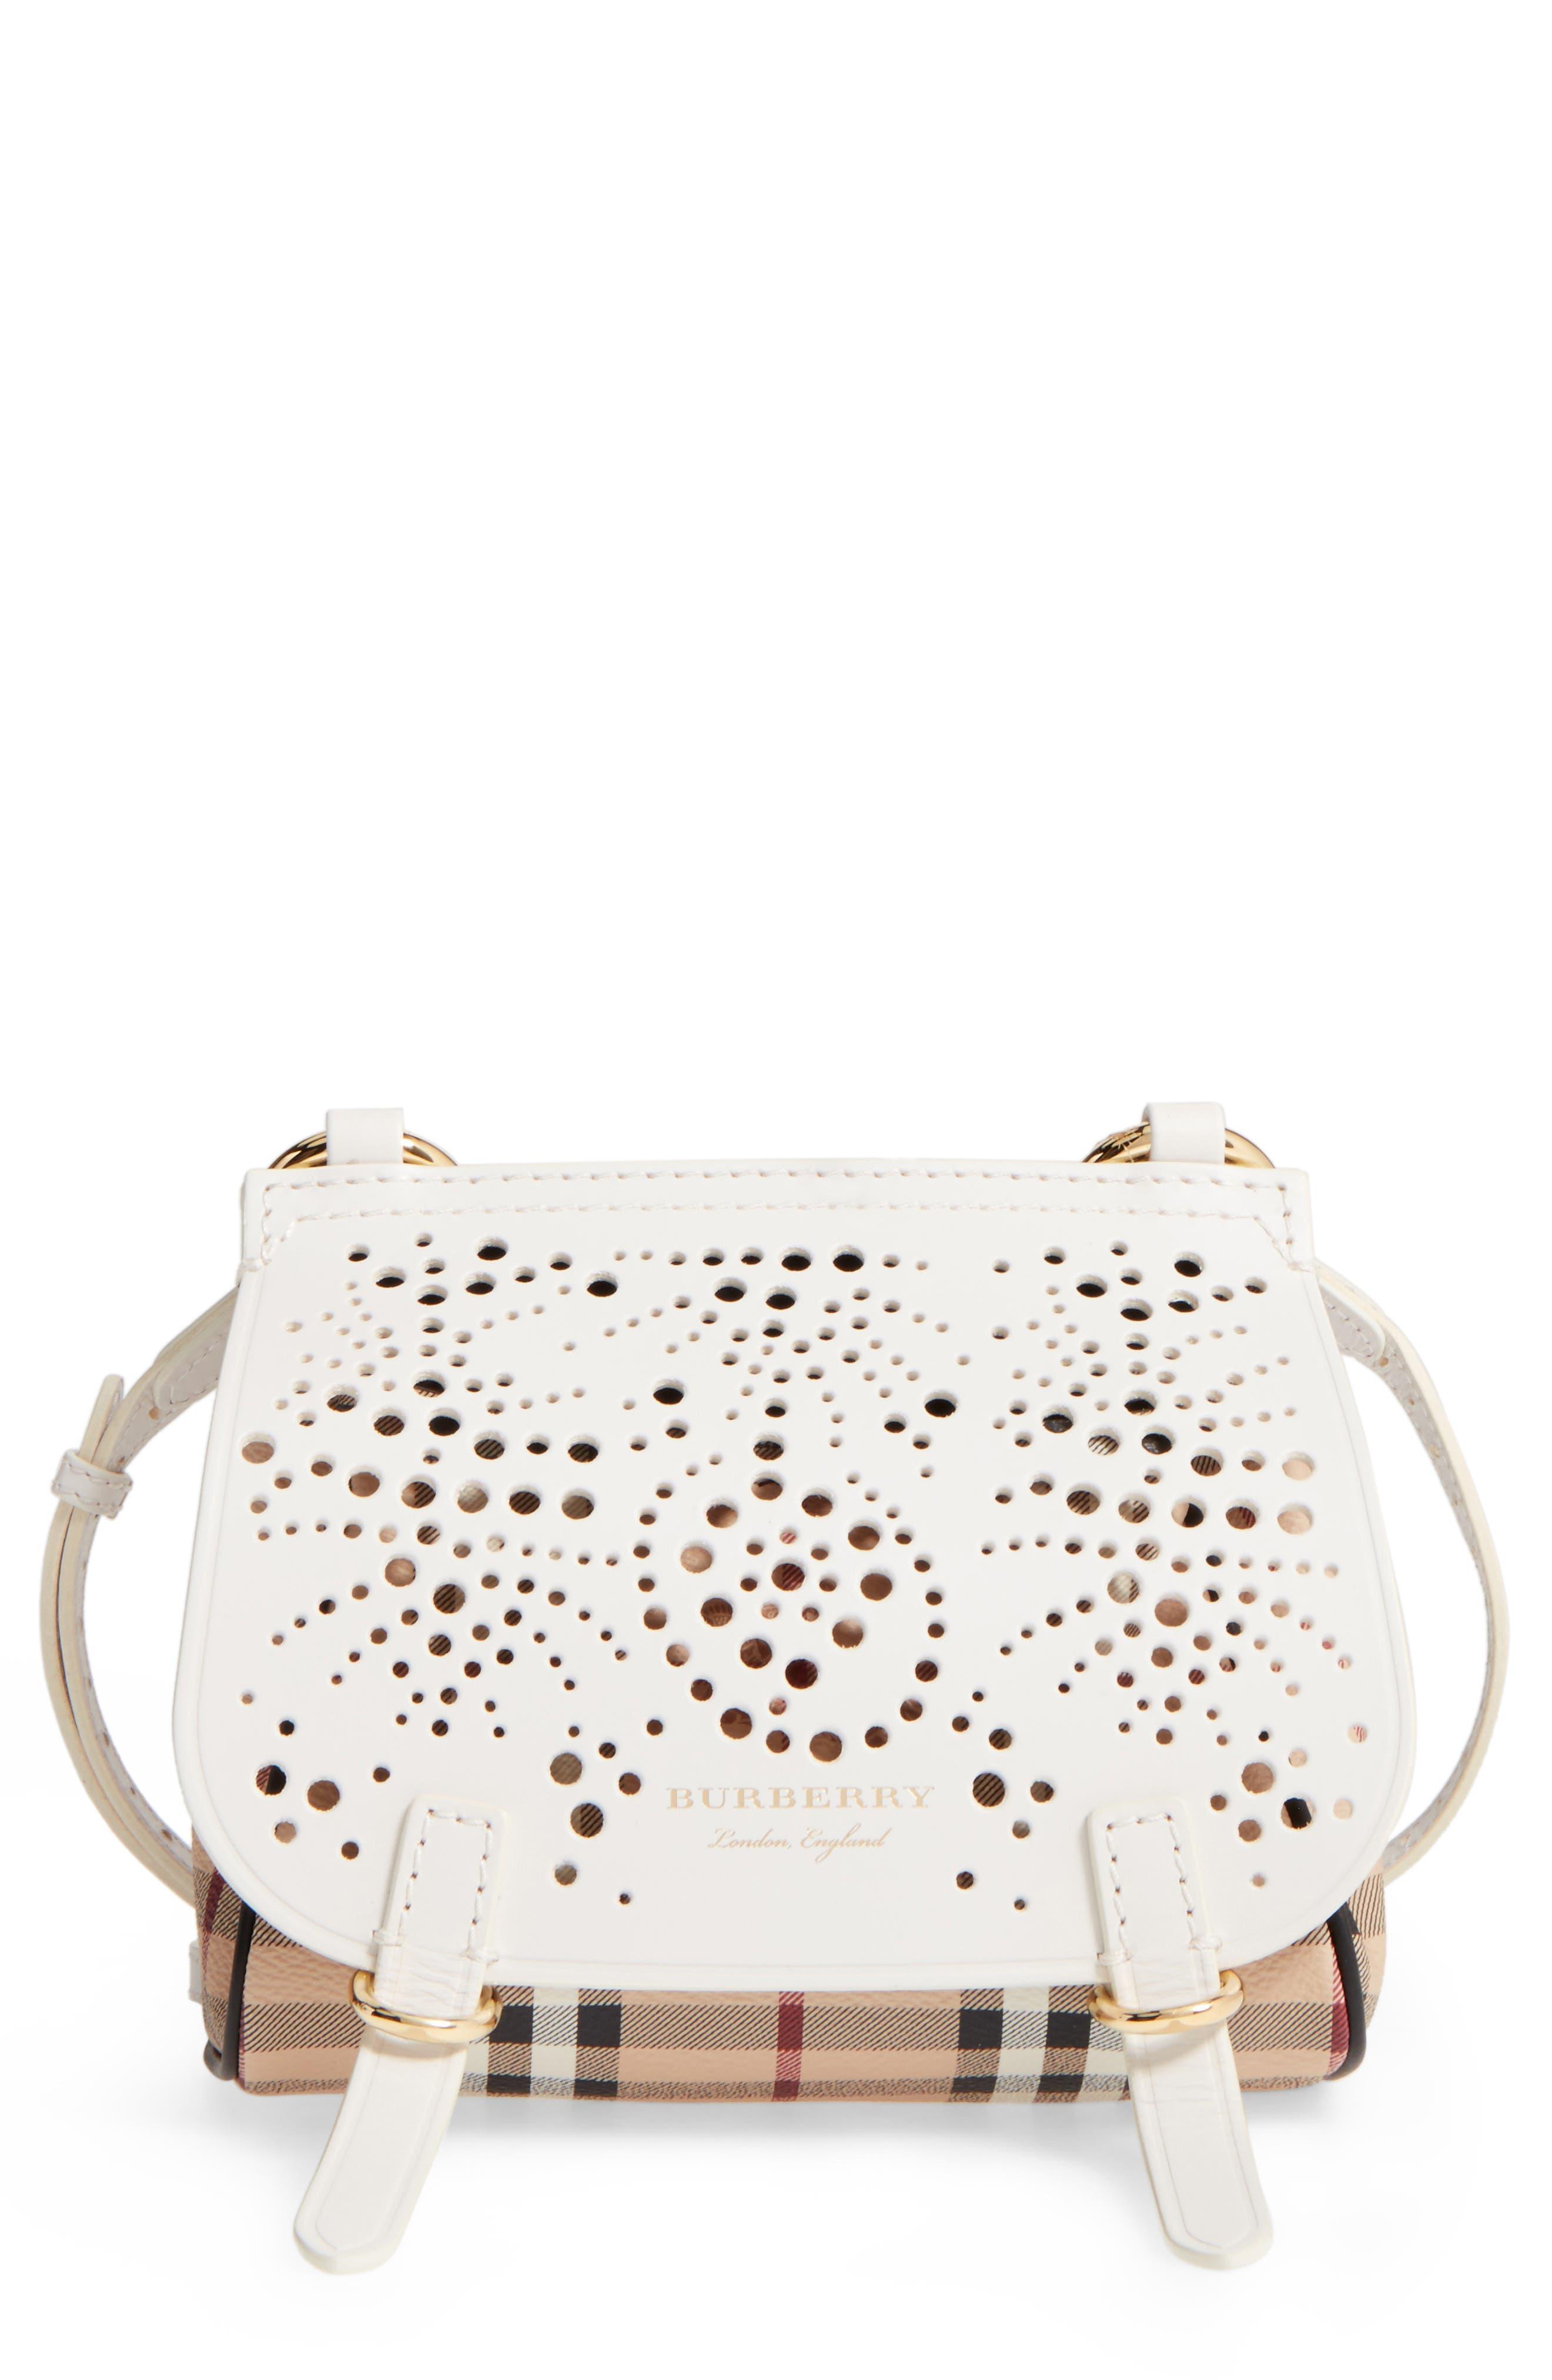 Burberry Baby Bridle Crossbody Bag